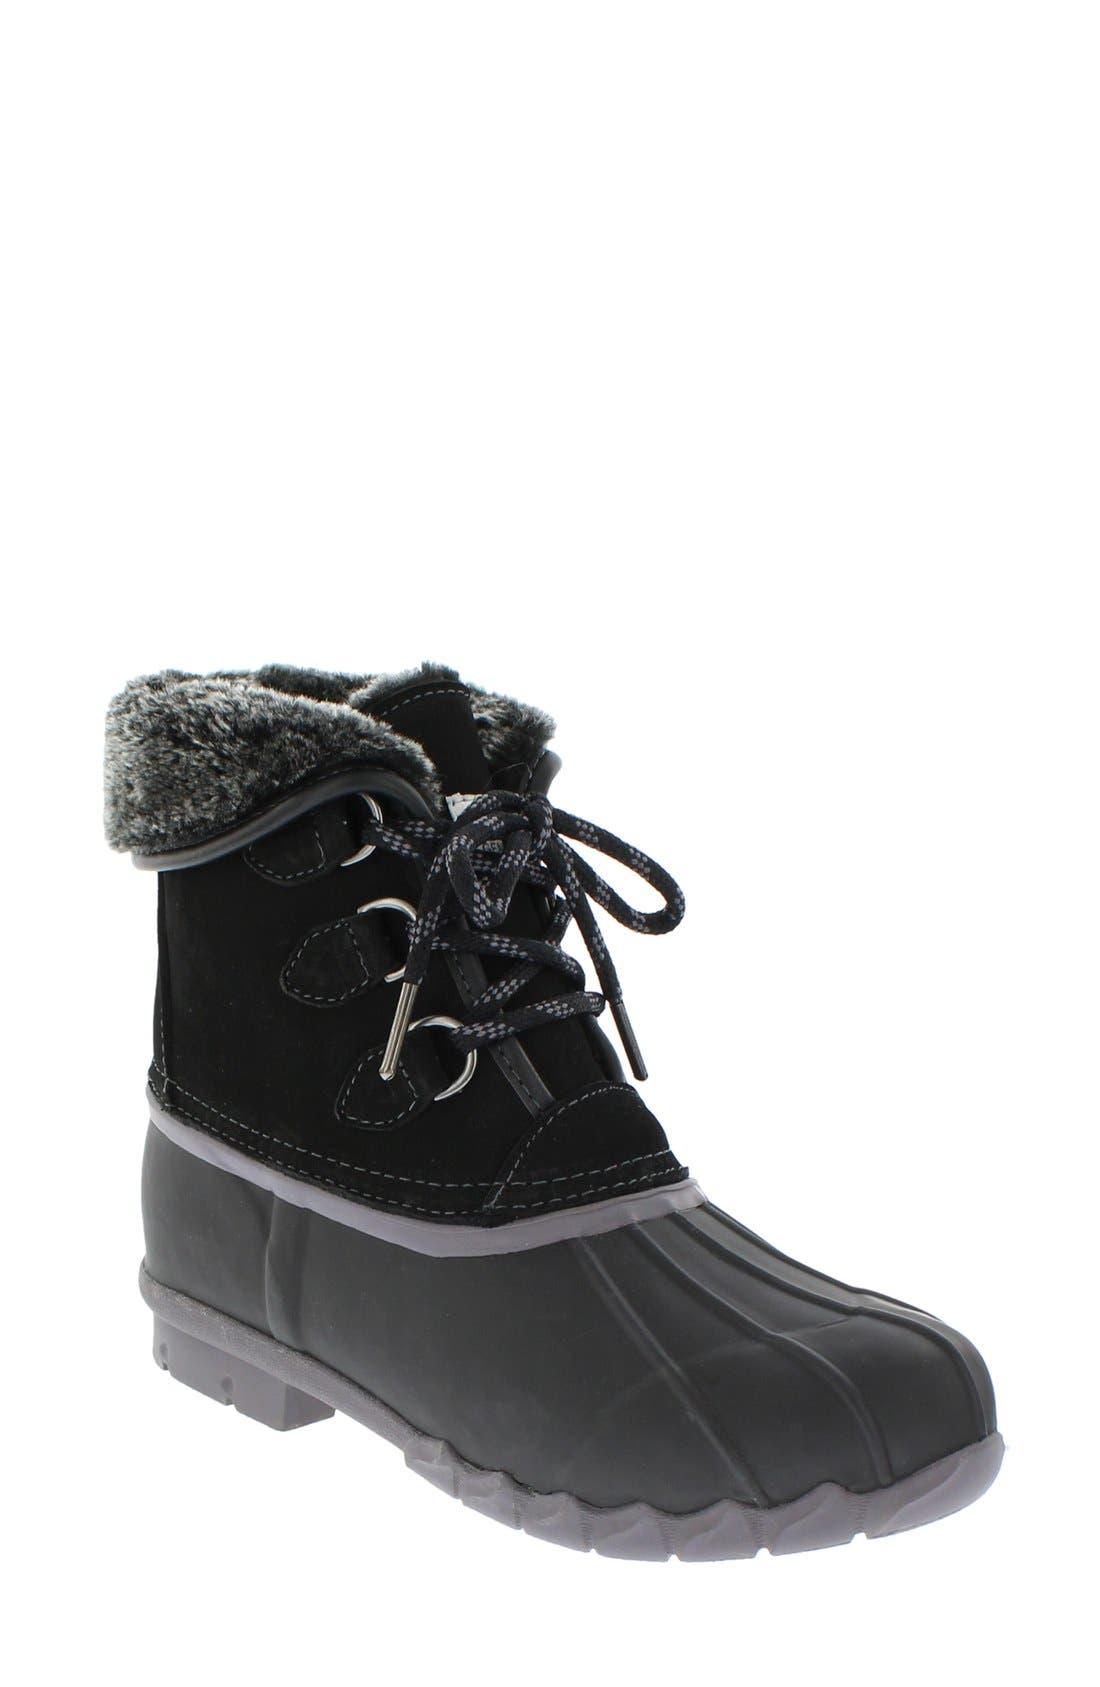 Defrost Faux Fur Lined Duck Boot,                         Main,                         color, Black/ Black